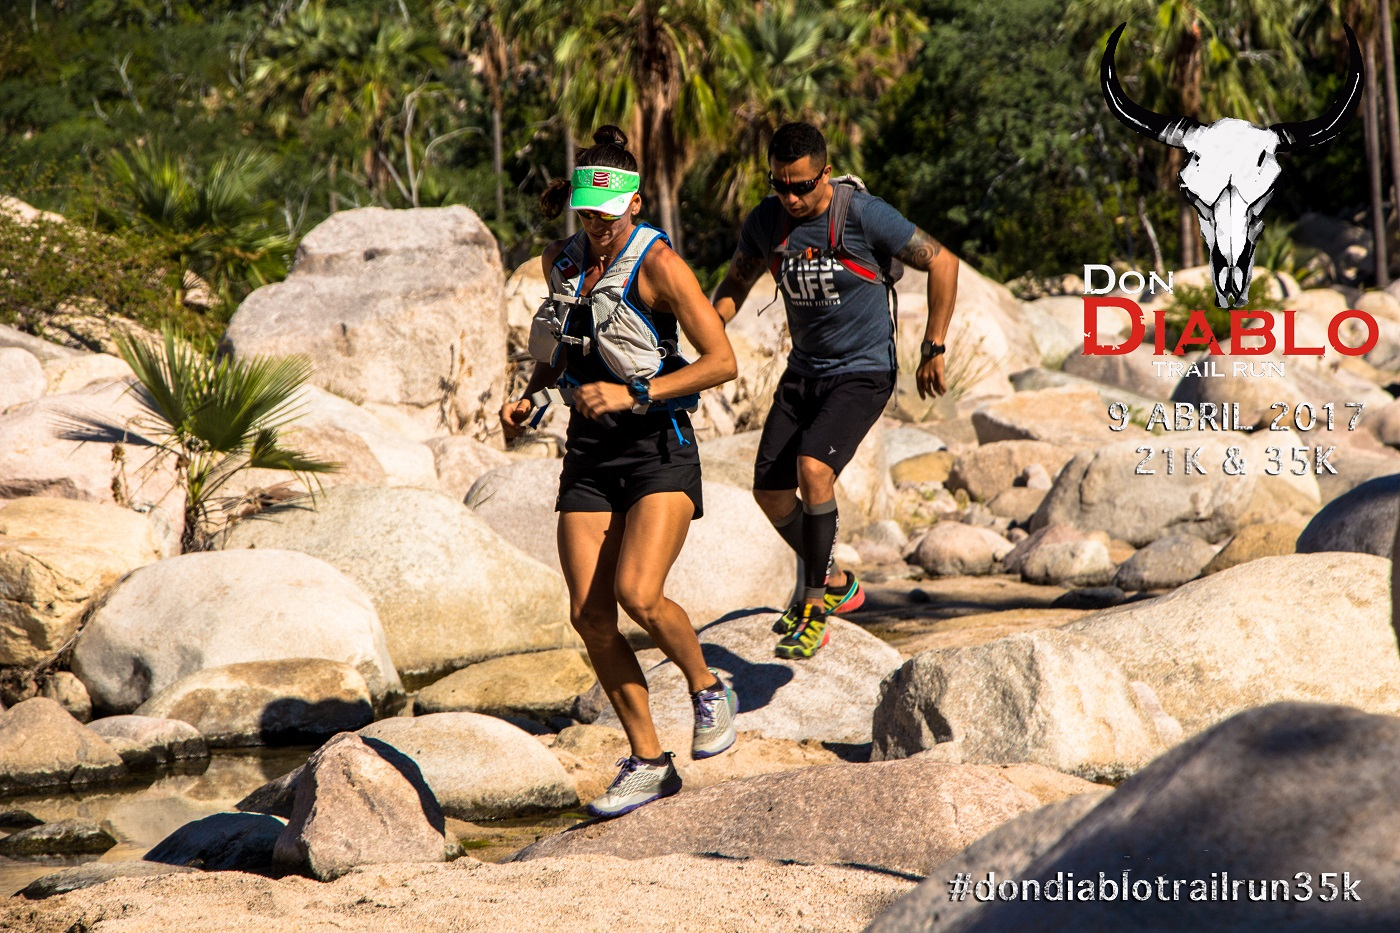 don-diablo-trail-run-35km-ultra-endurance-baja-sur.jpg